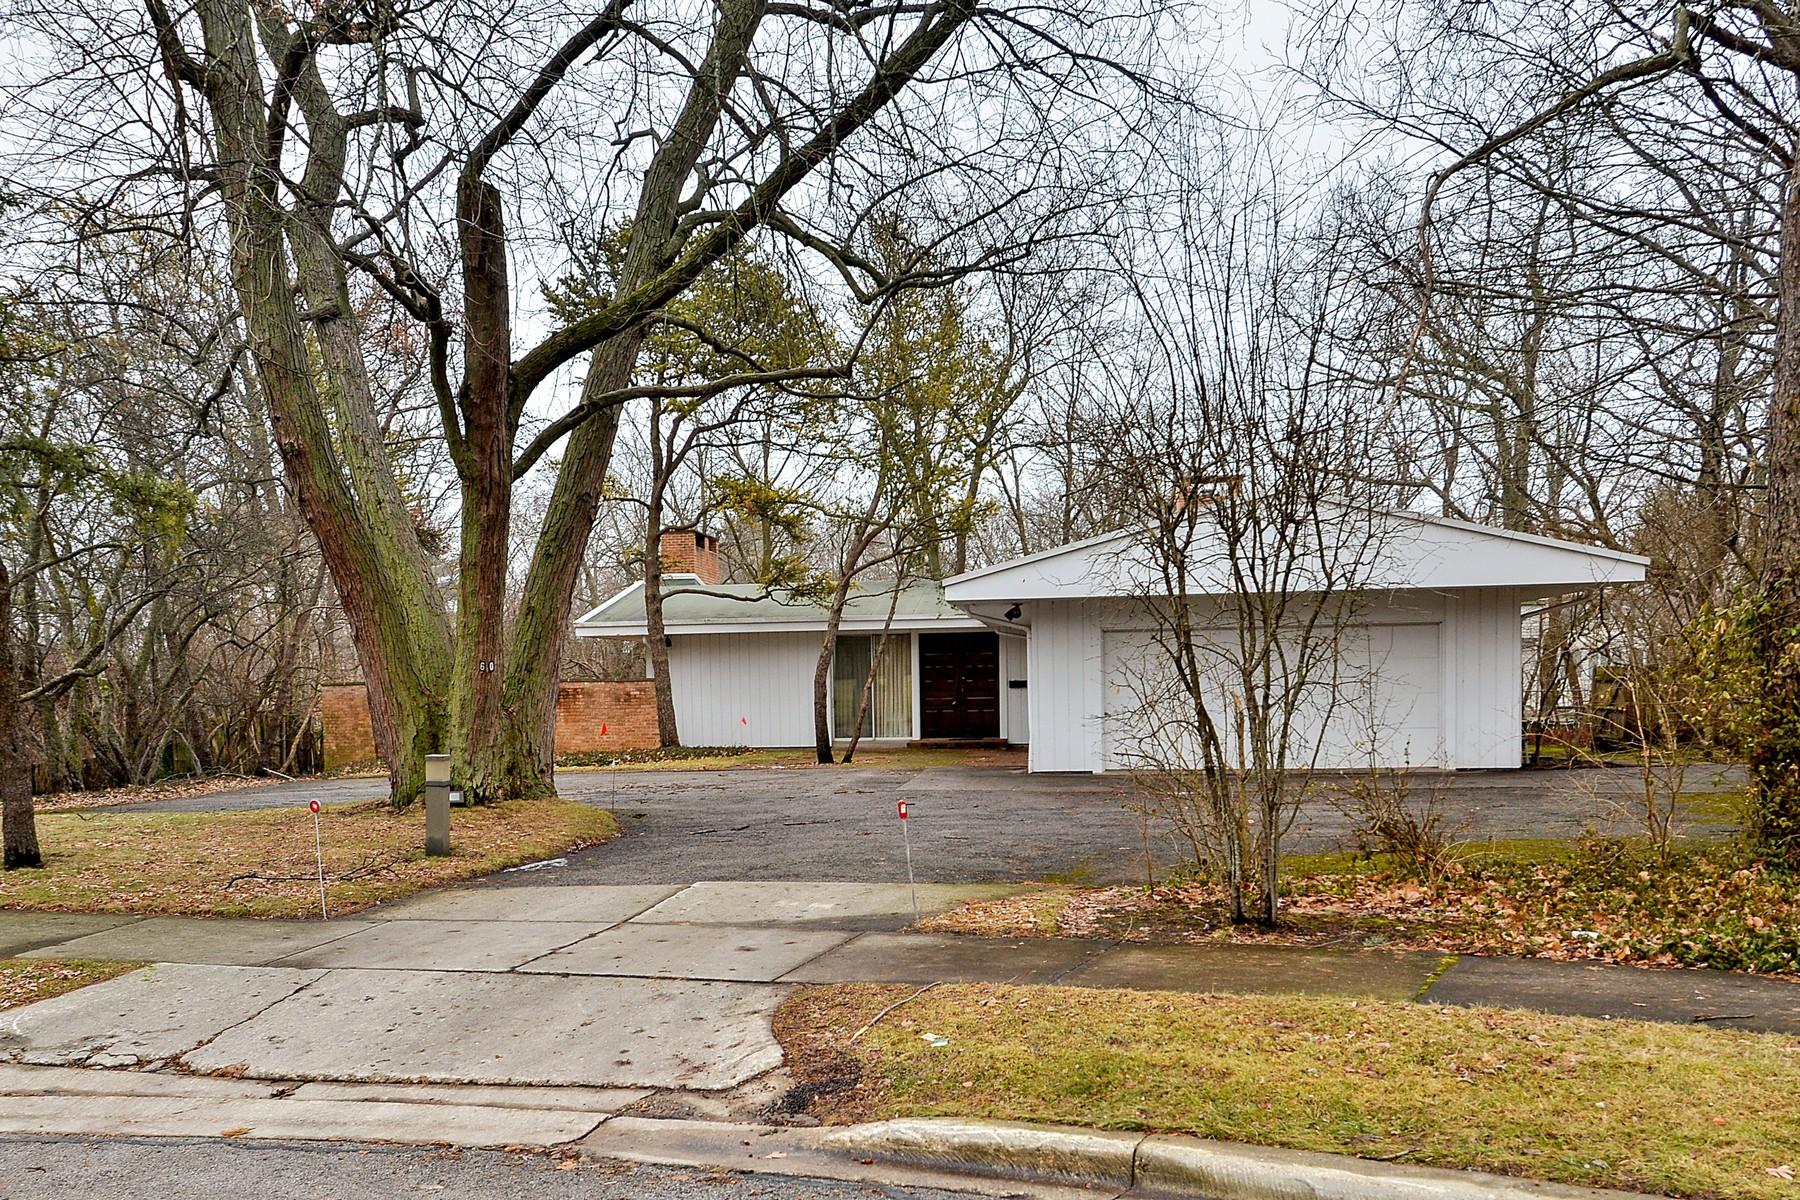 獨棟家庭住宅 為 出售 在 Spectacular Location for a Redevelopment Project 60 Brentwood Drive Glencoe, 伊利諾斯州, 60022 美國